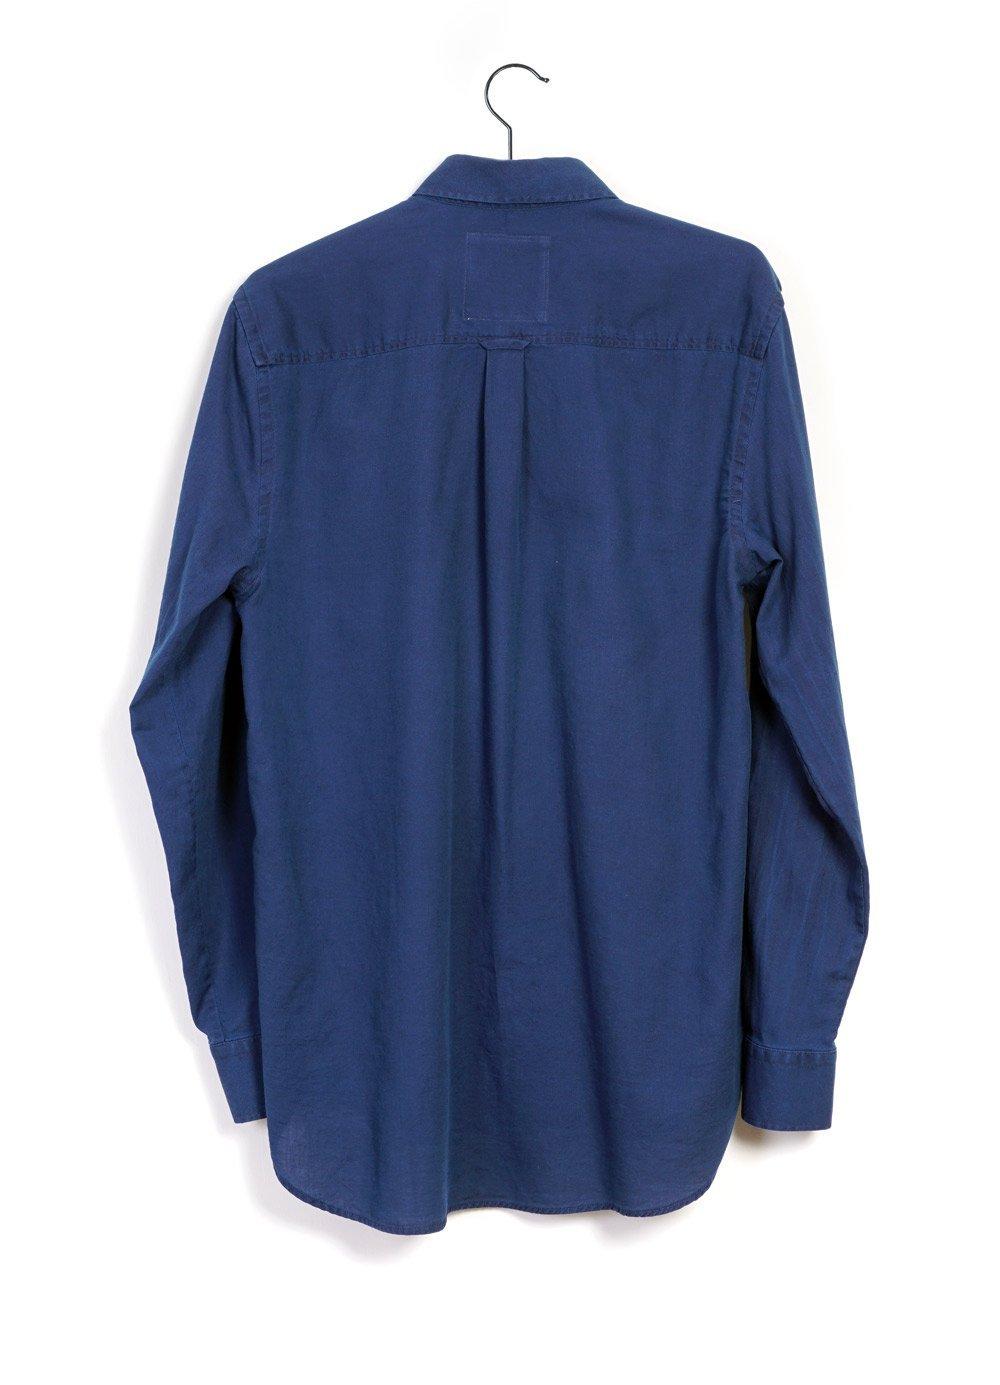 Hansen Garments HENNING | Casual Classic Shirt | Indigo